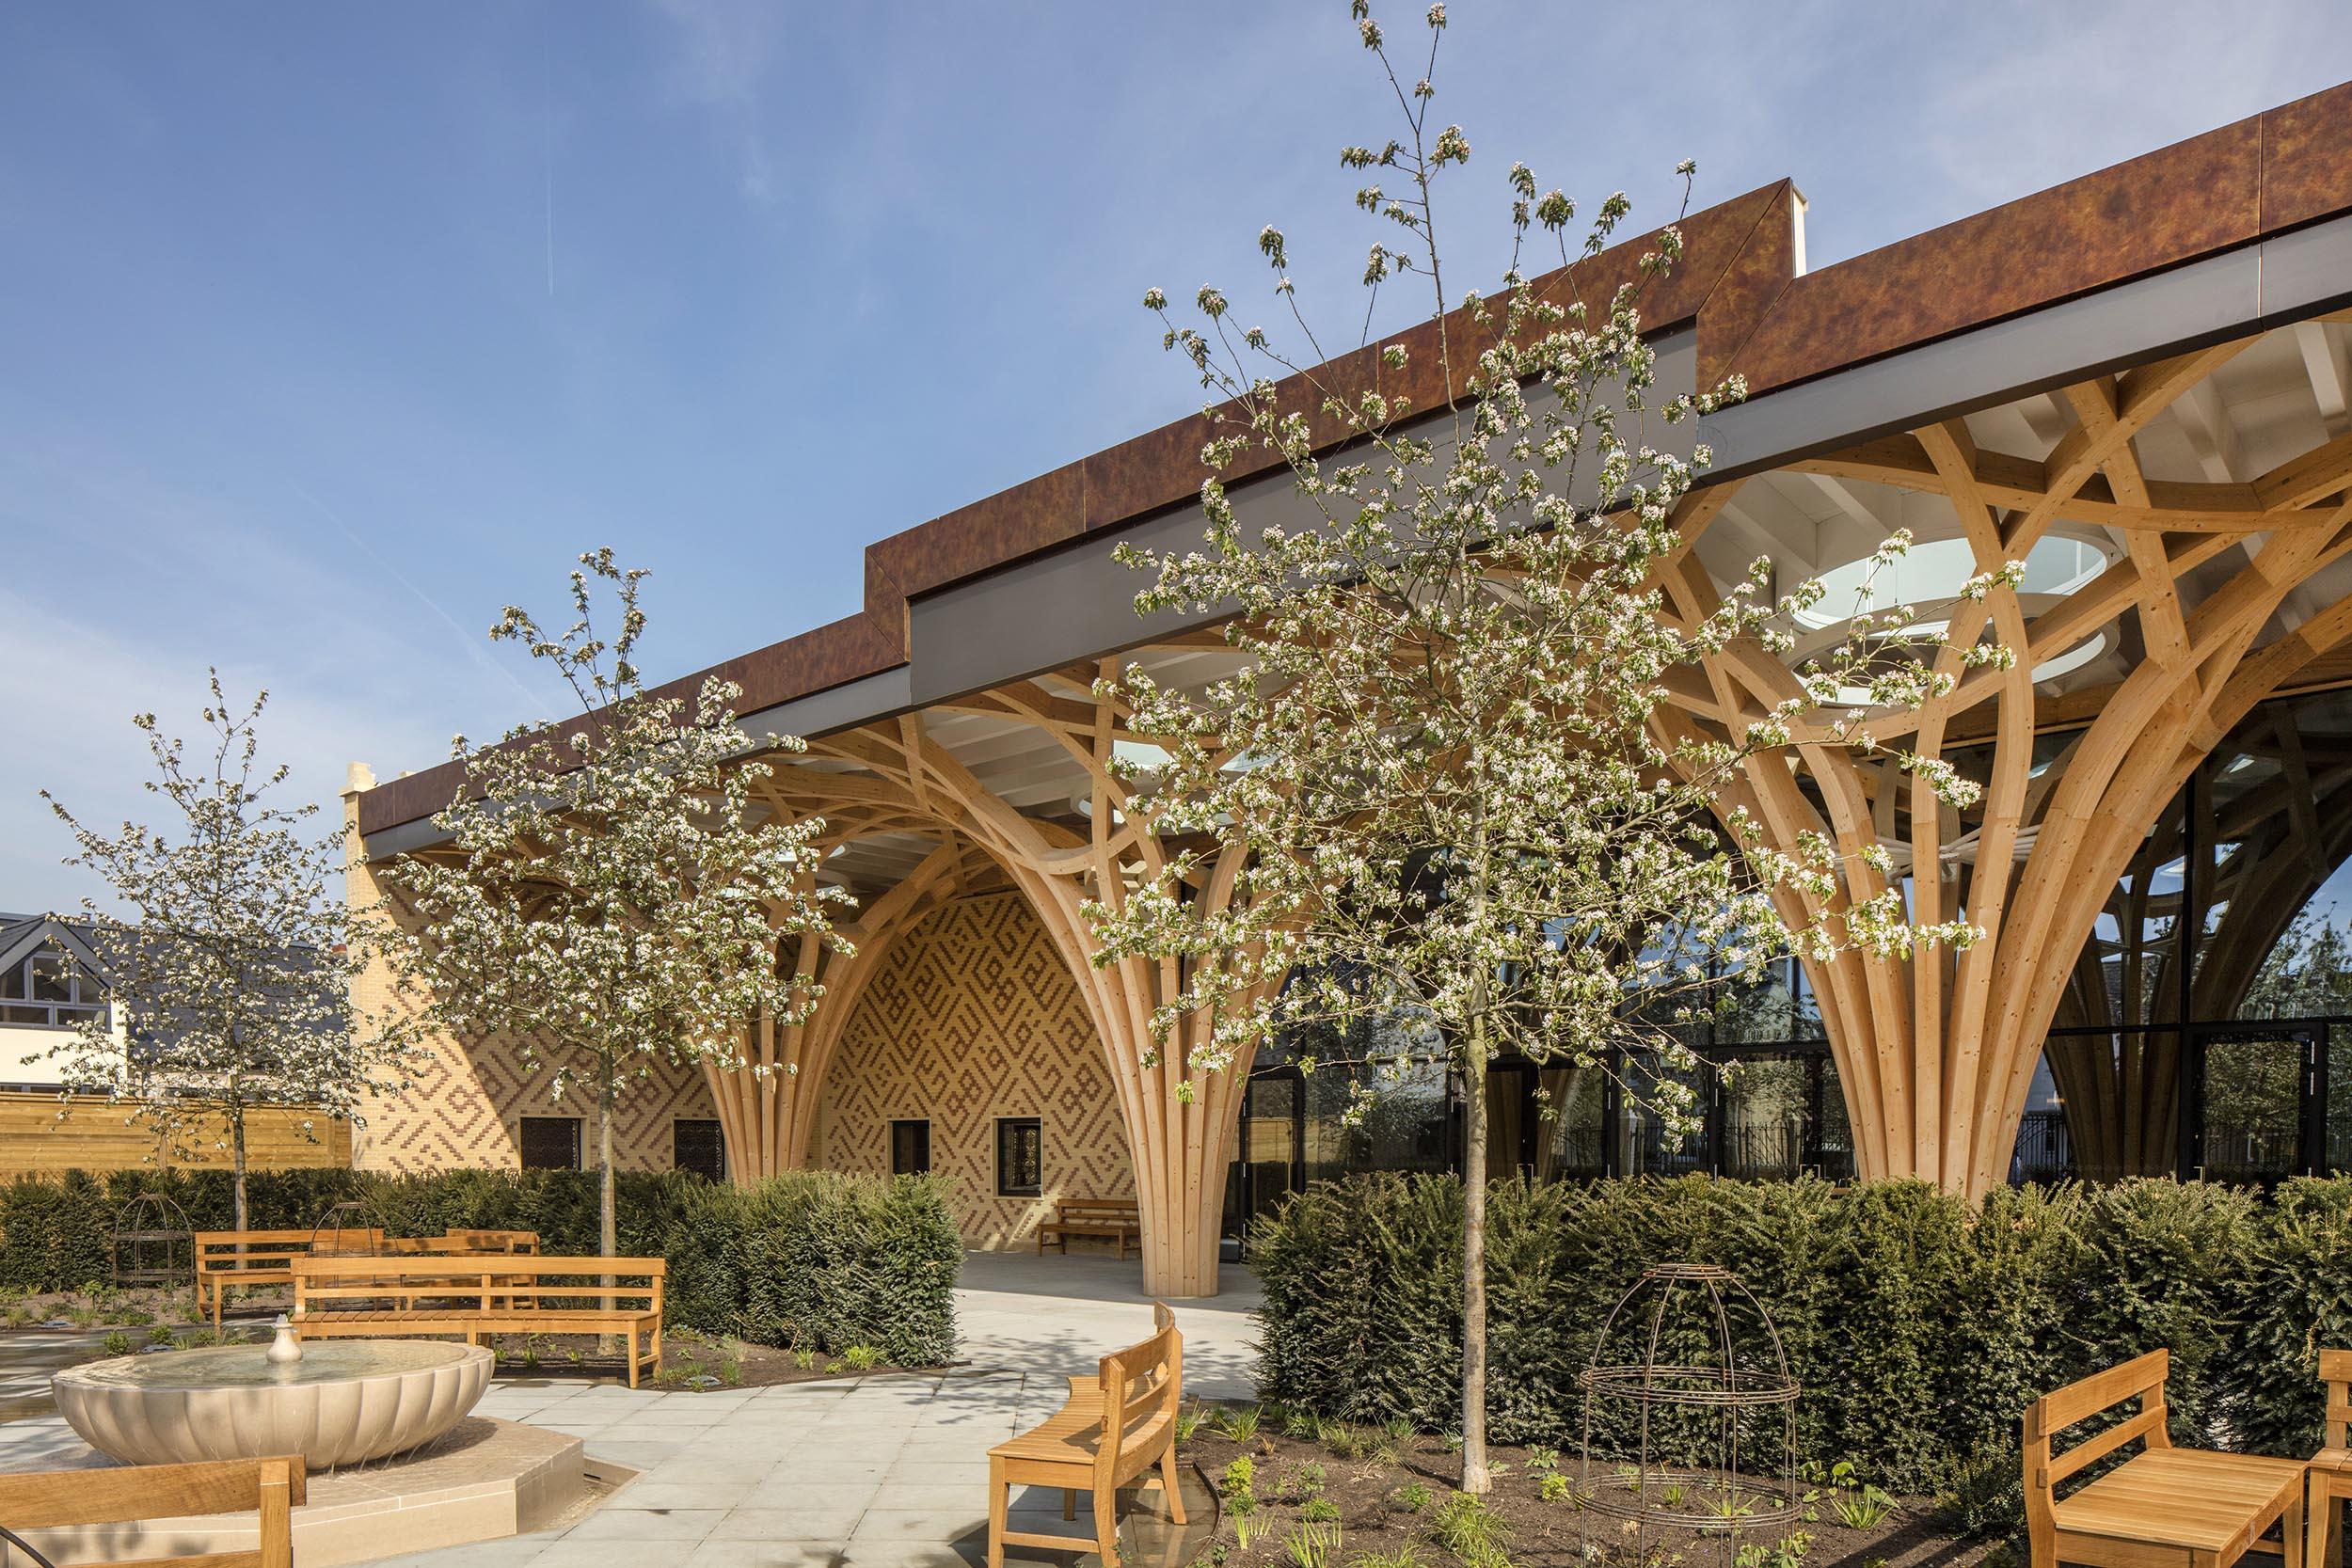 Cambridge Mosque - Islamic garden, fountain & front portico - by Marks Barfield Architects, photo Morley von Sternberg